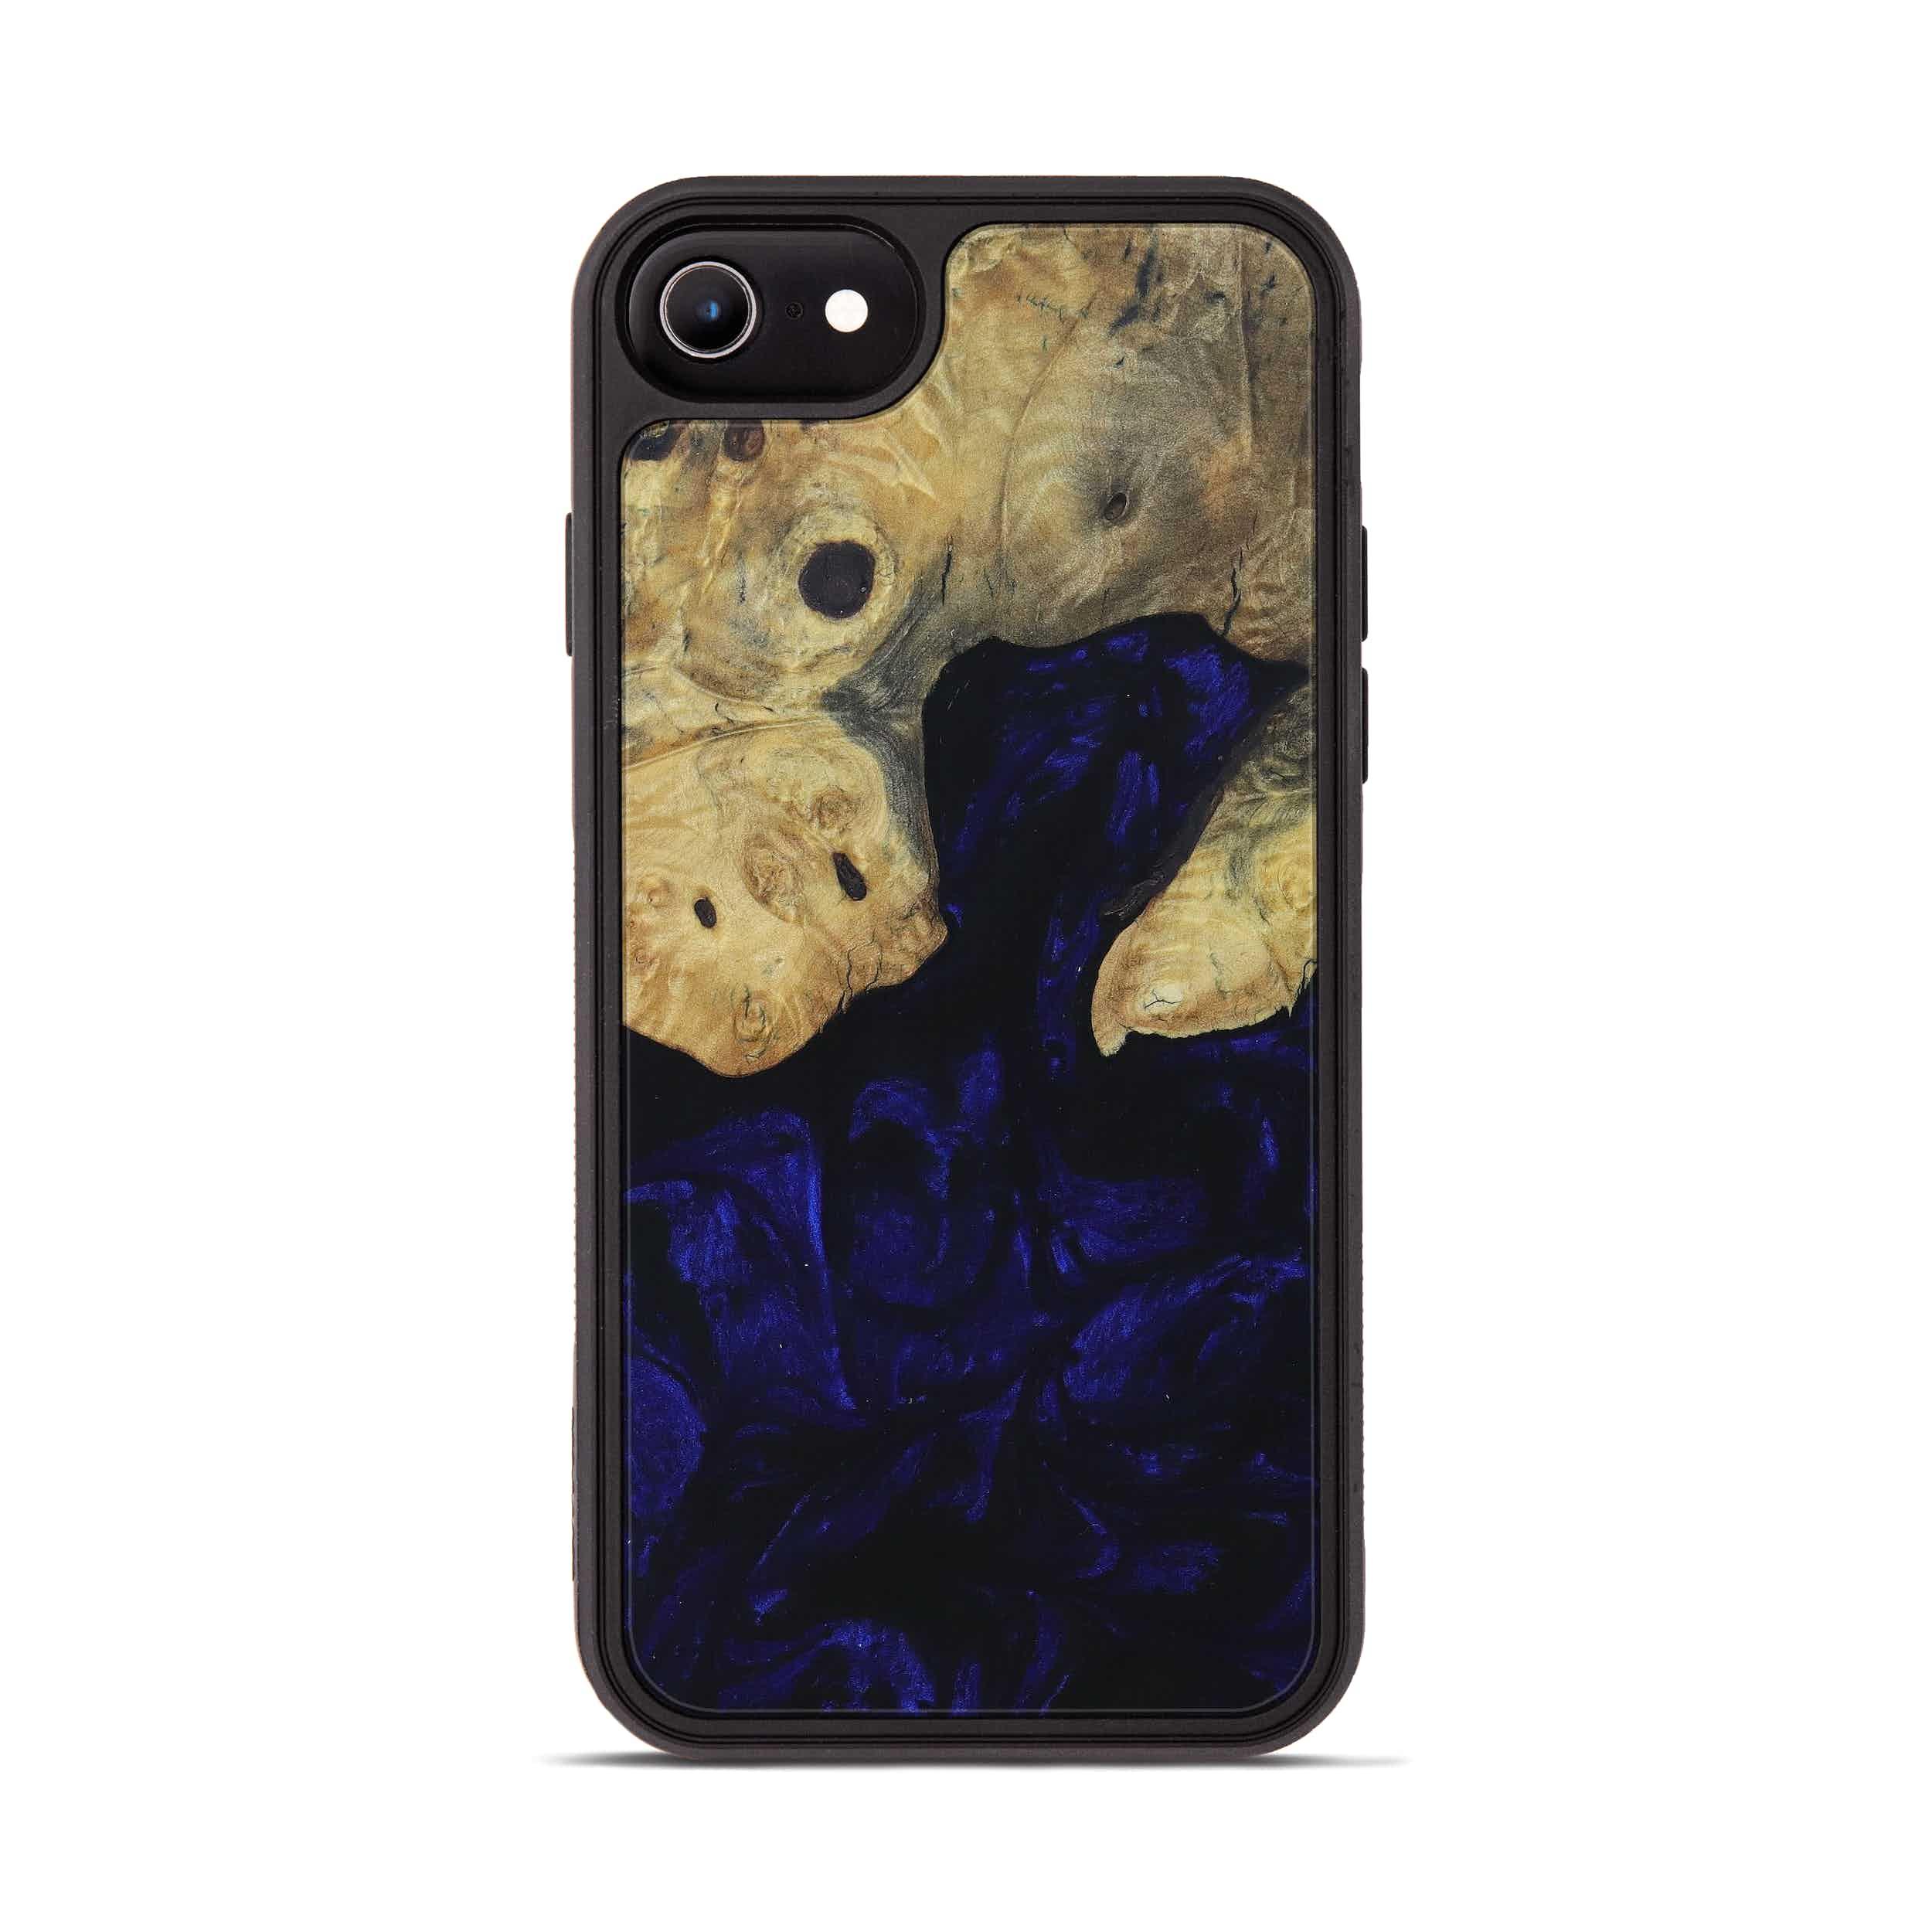 iPhone 6s Wood+Resin Phone Case - Fwpreg (Dark Blue, 396040)